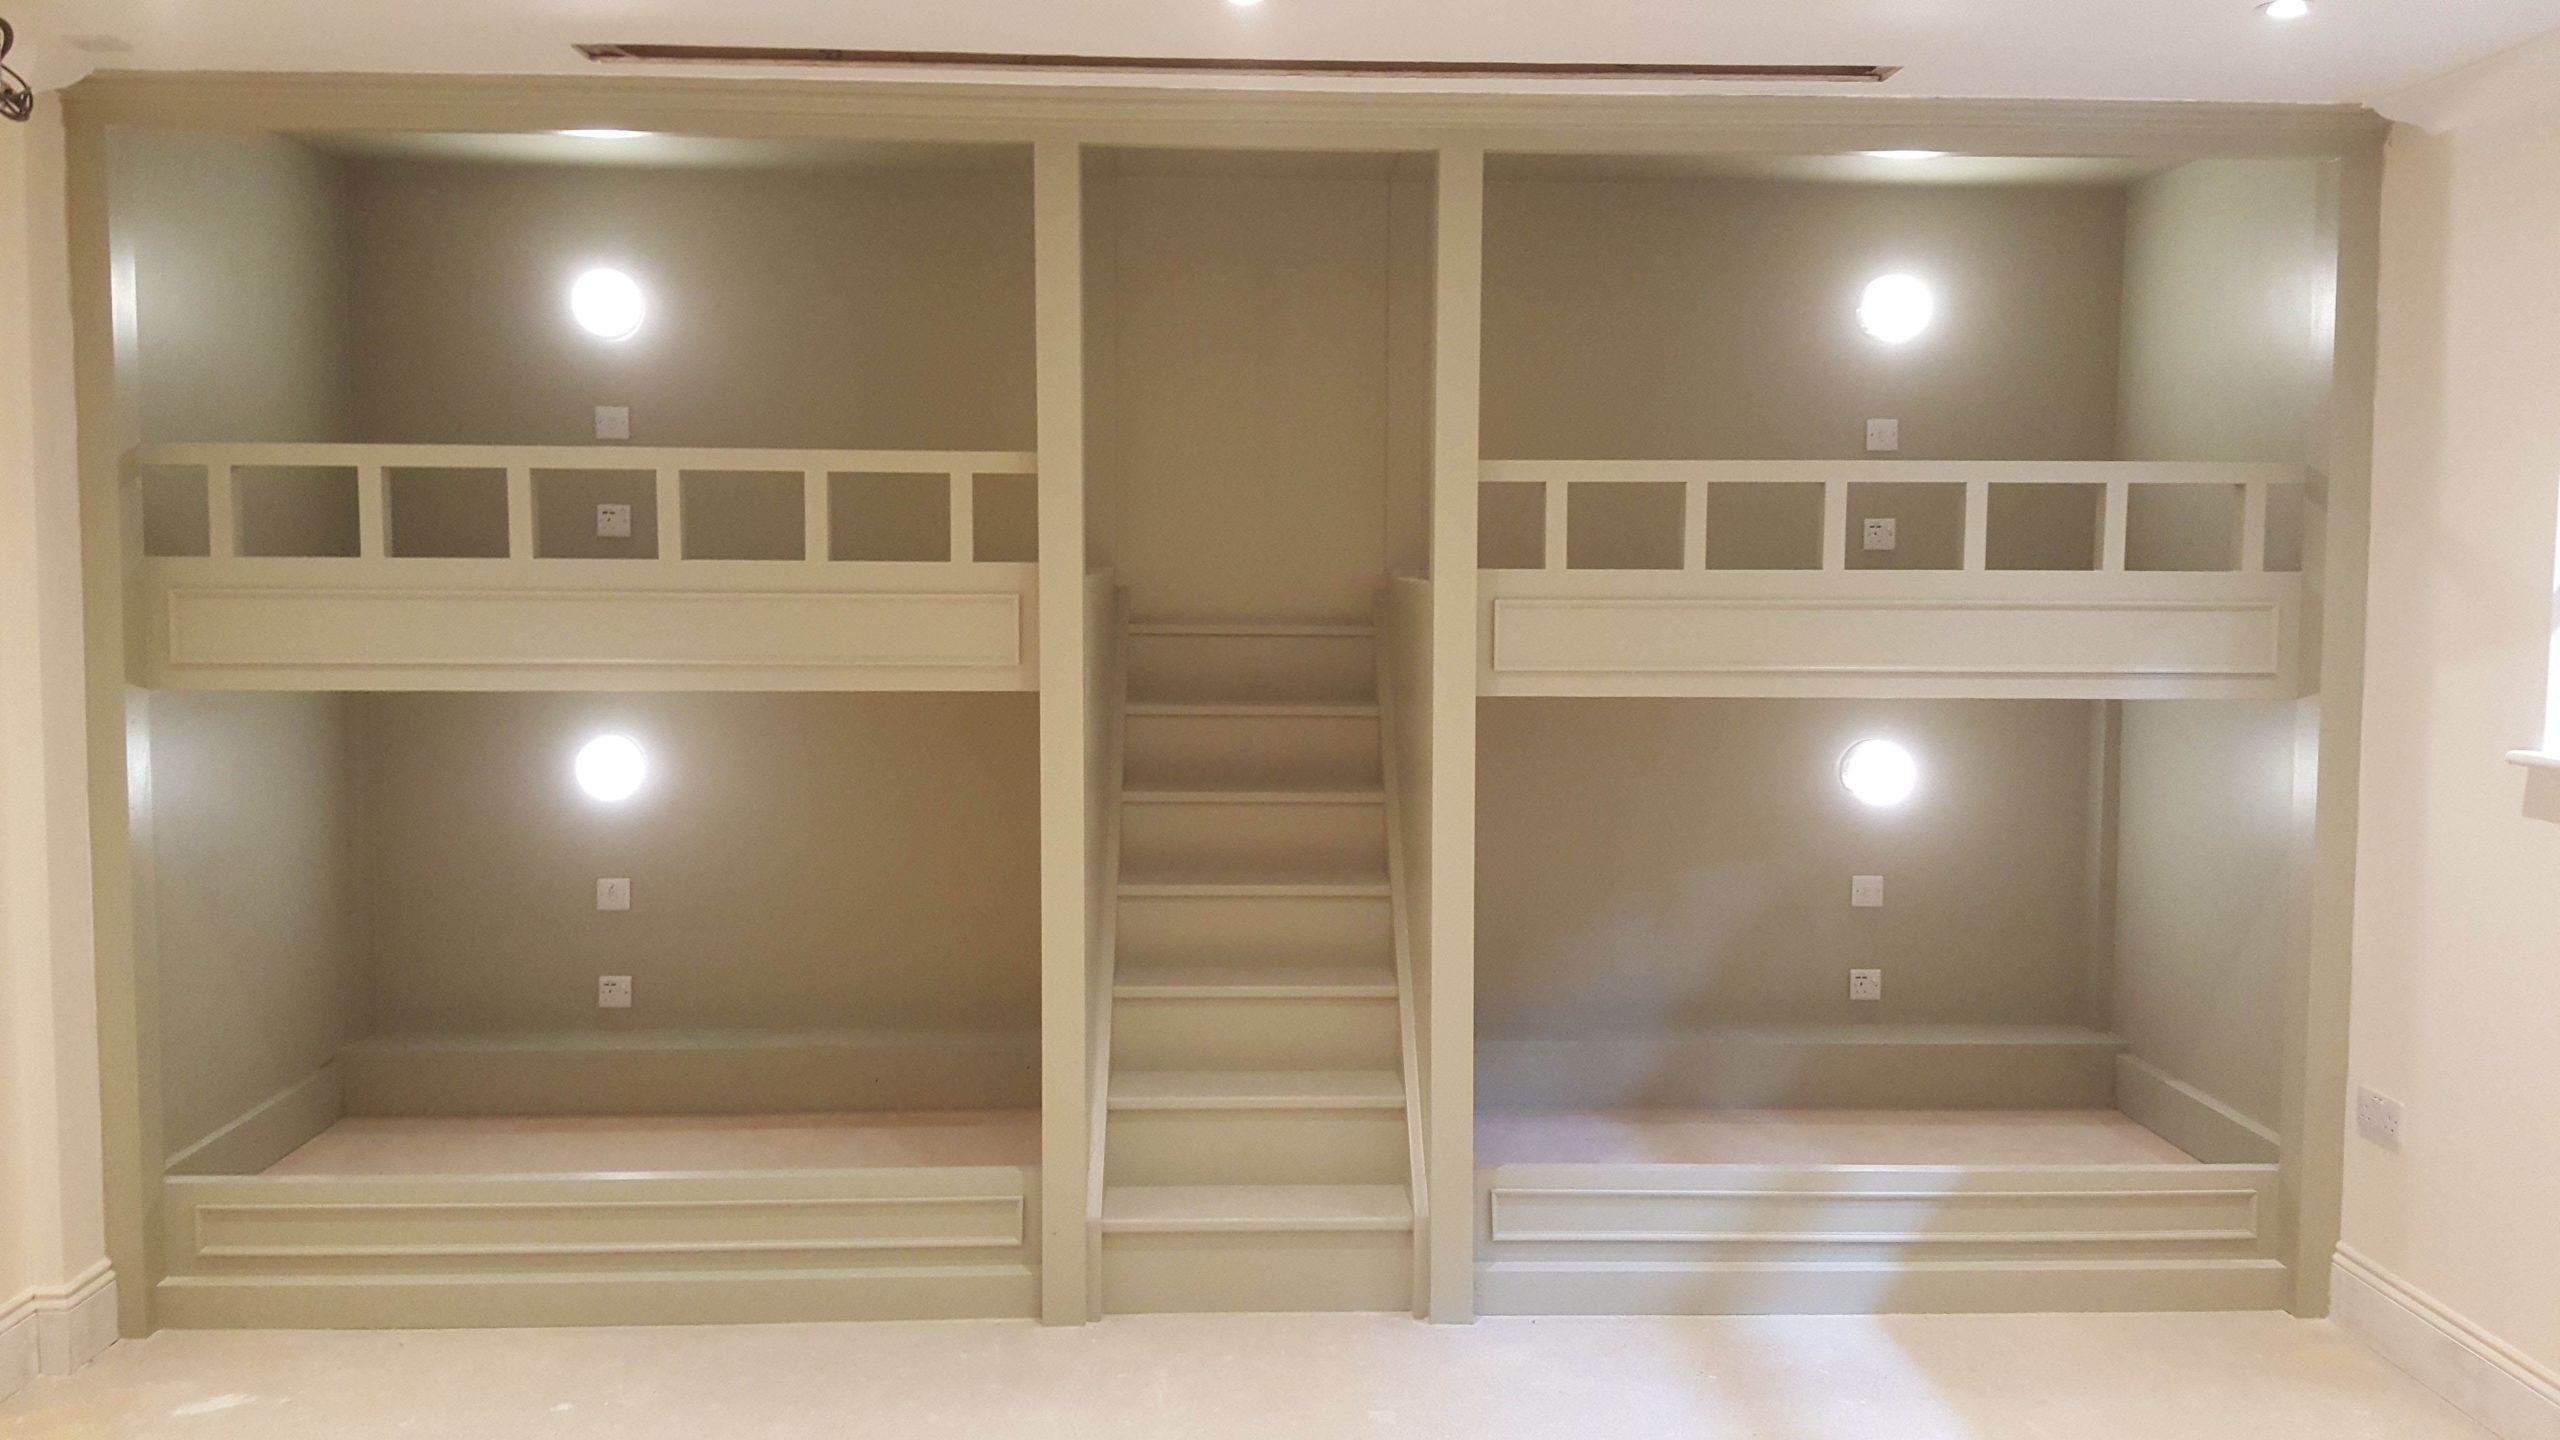 With Slide in 2020 Diy bunk bed, Bunk bed designs, Bunk